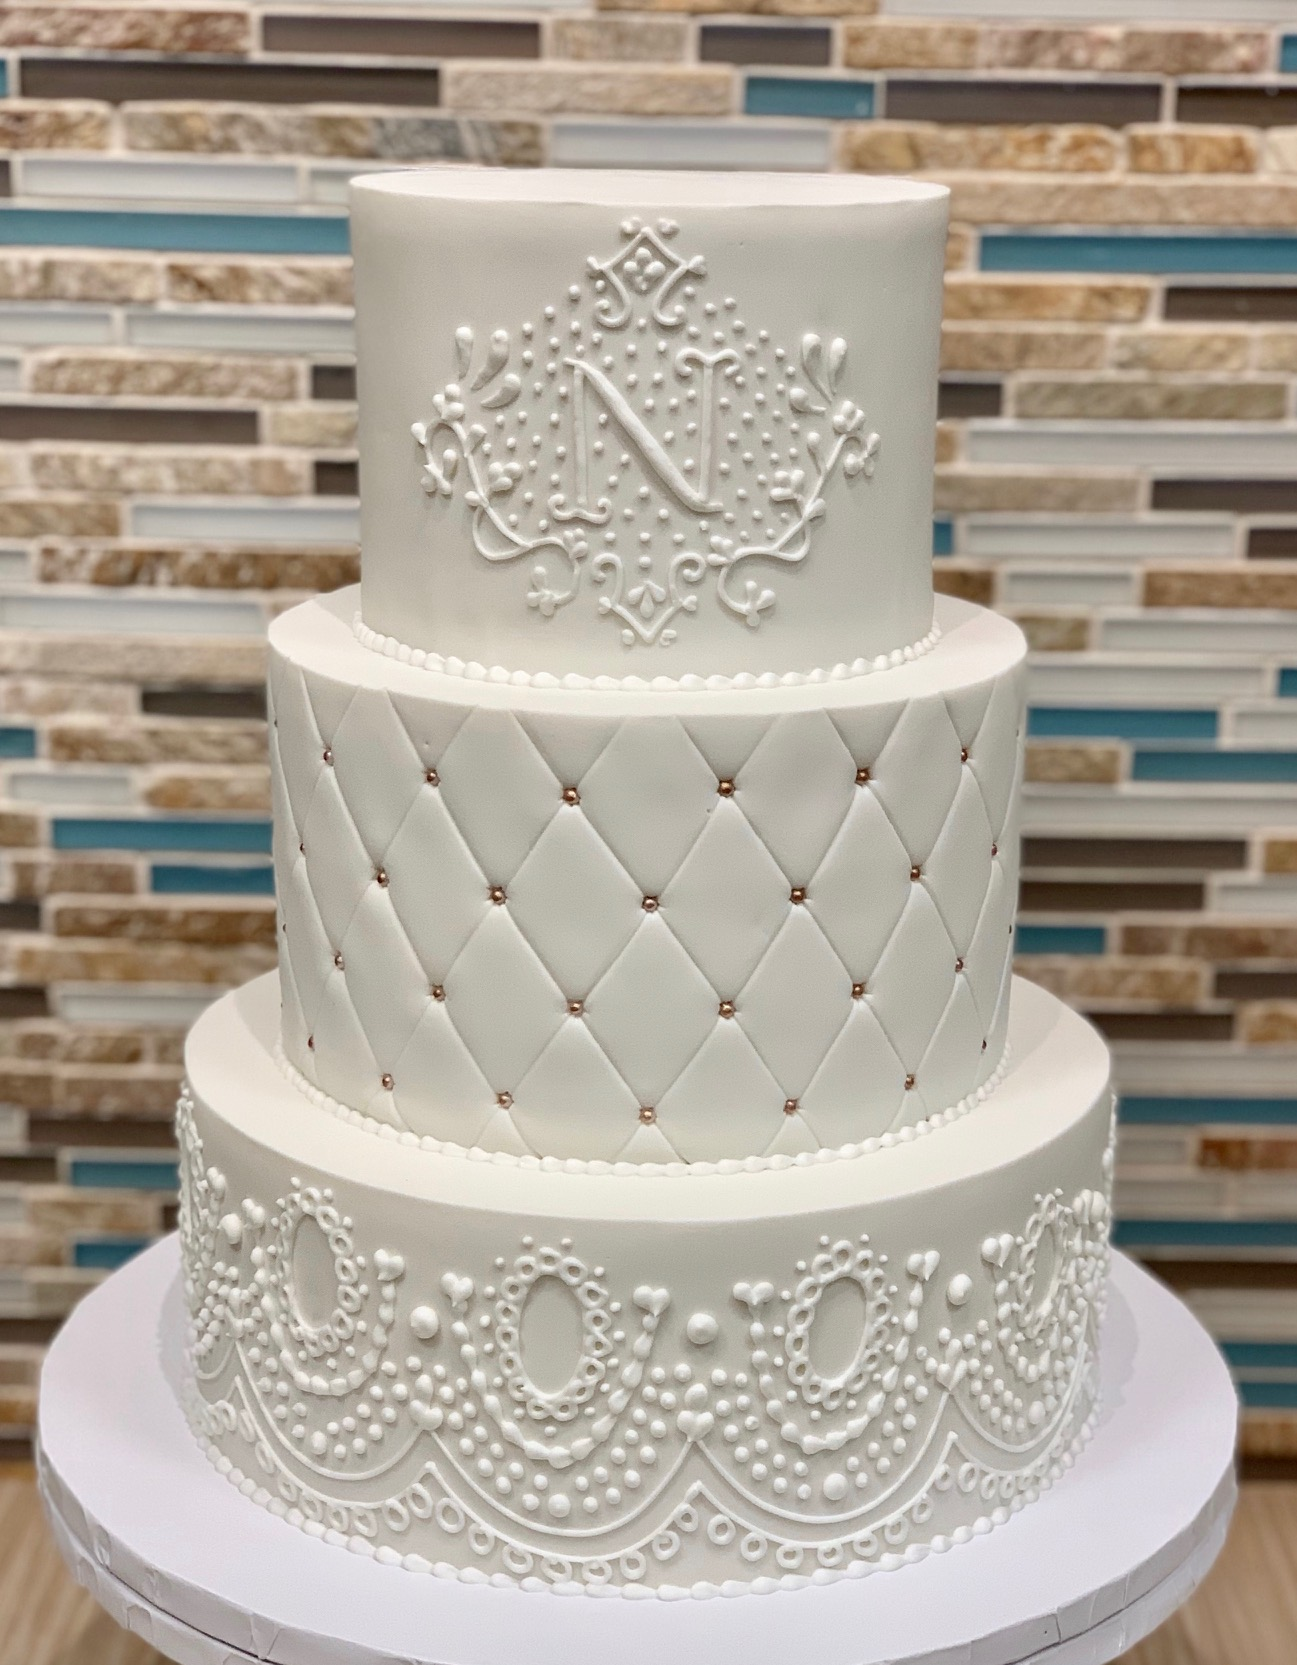 LAce Piping Wedding Cake Design